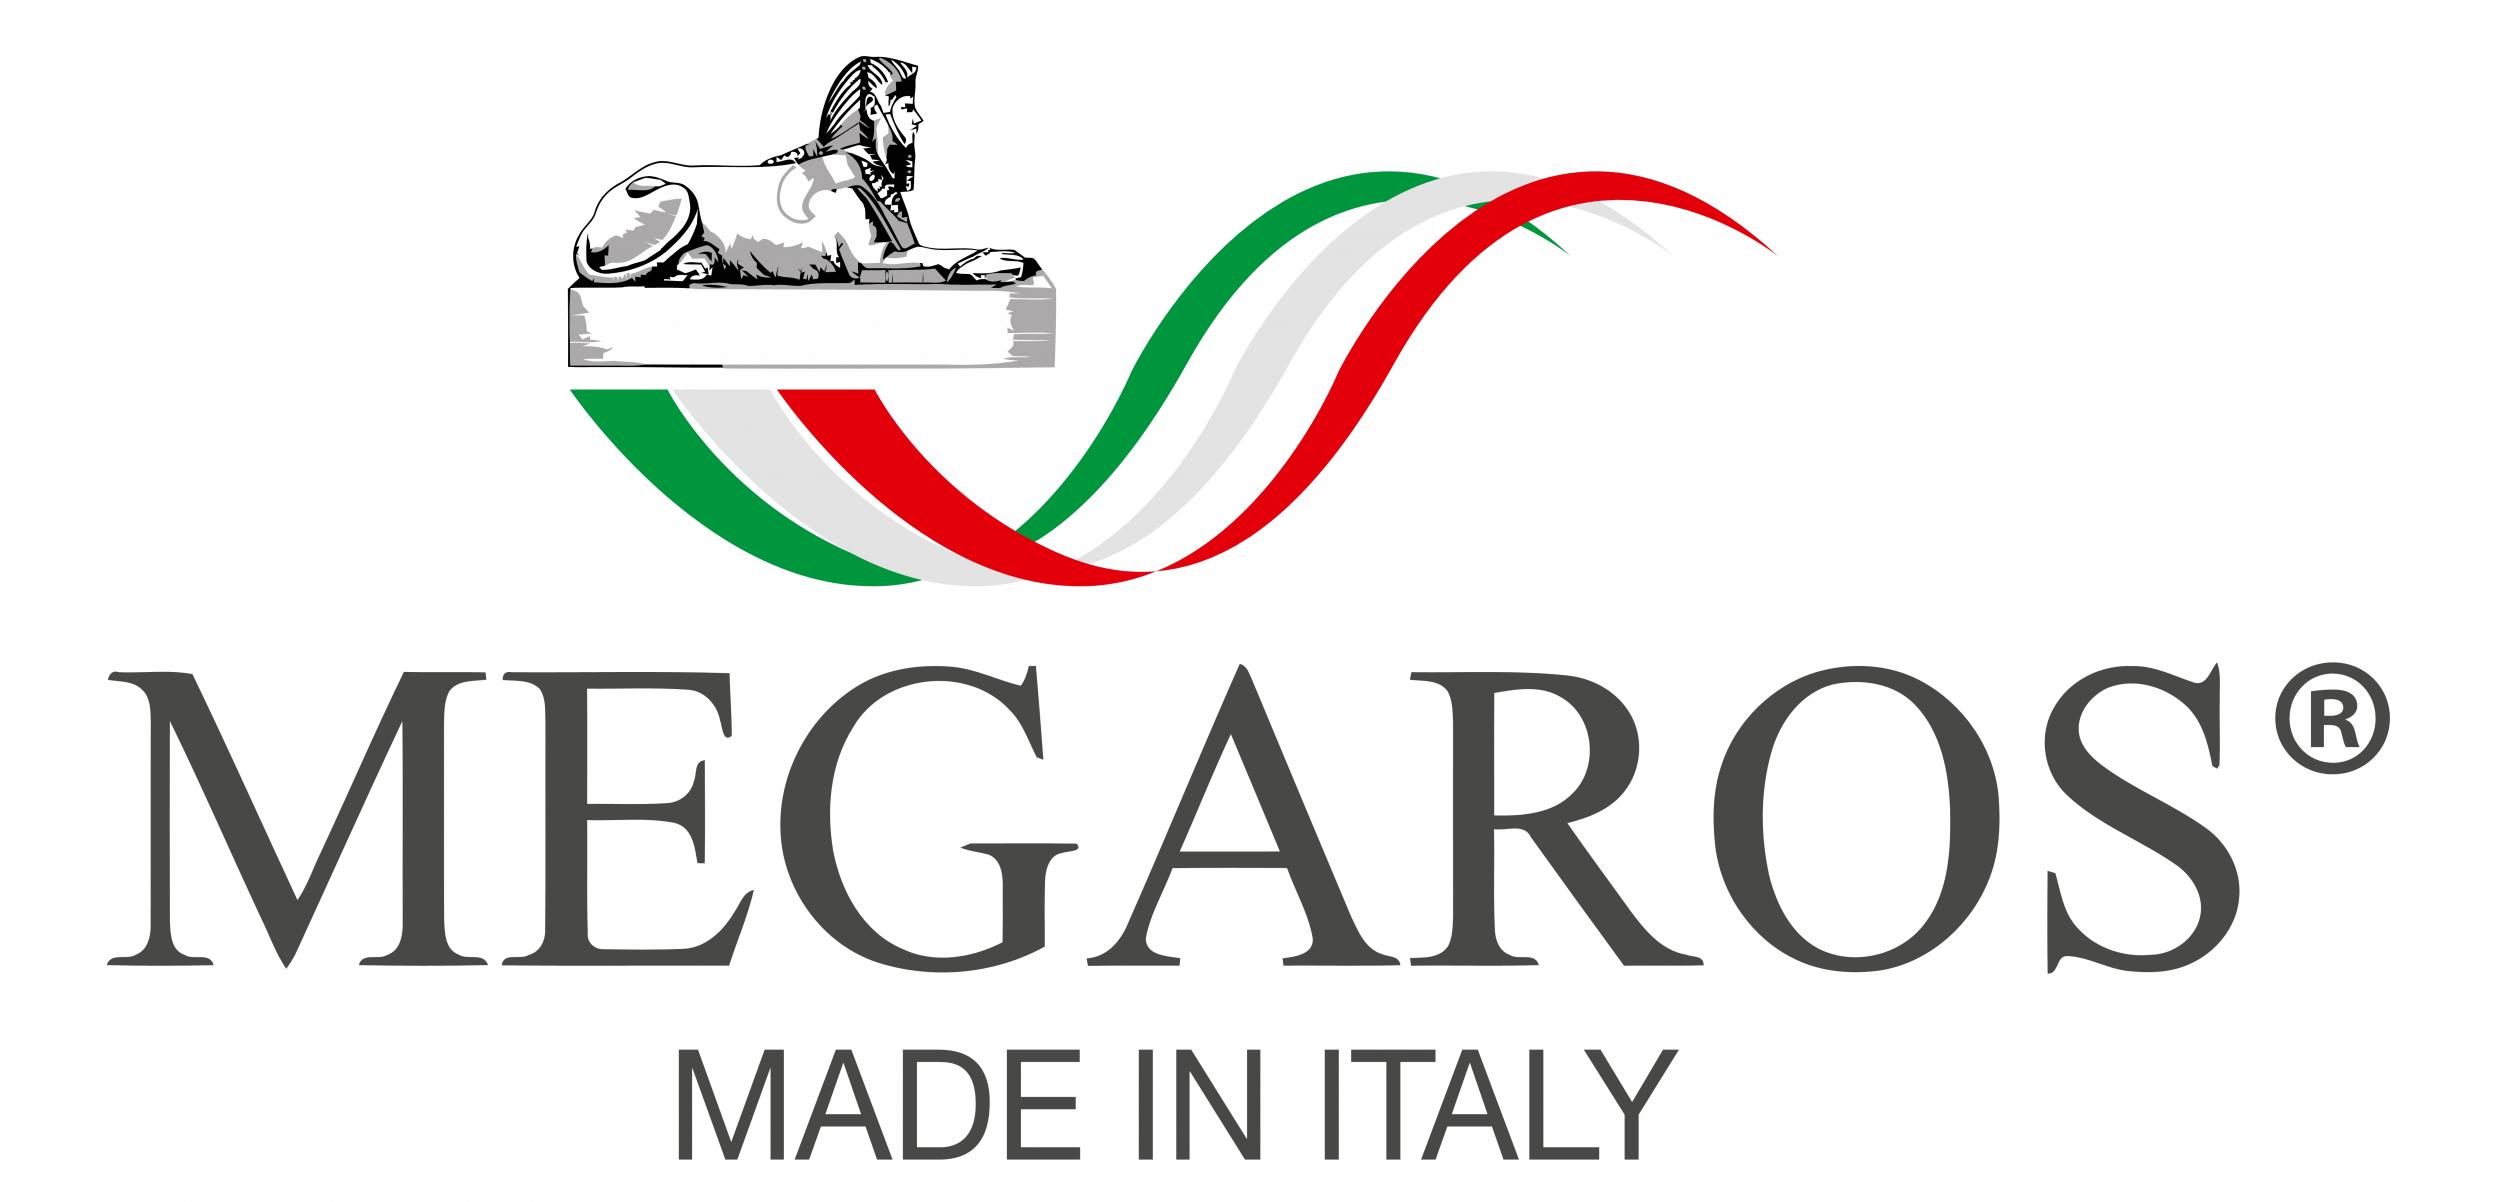 megaros-banner1.png